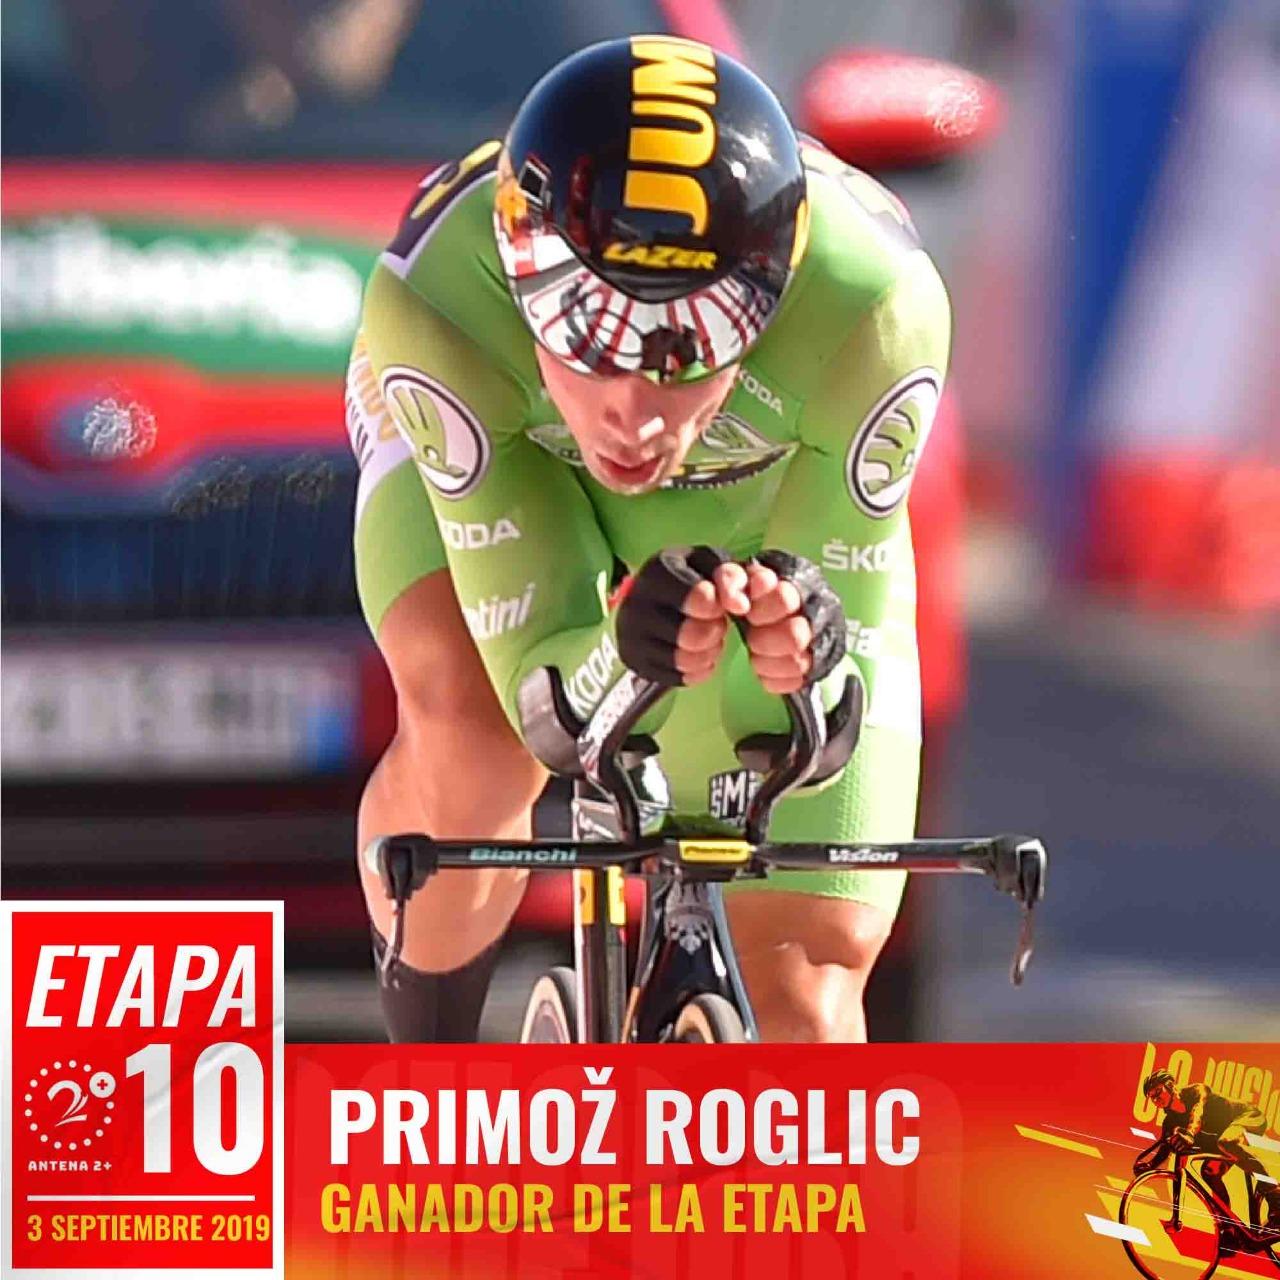 Primoz Roglic (Jumbo Visma) ganó la décima etapa y es nuevo líder de la Vuelta a España